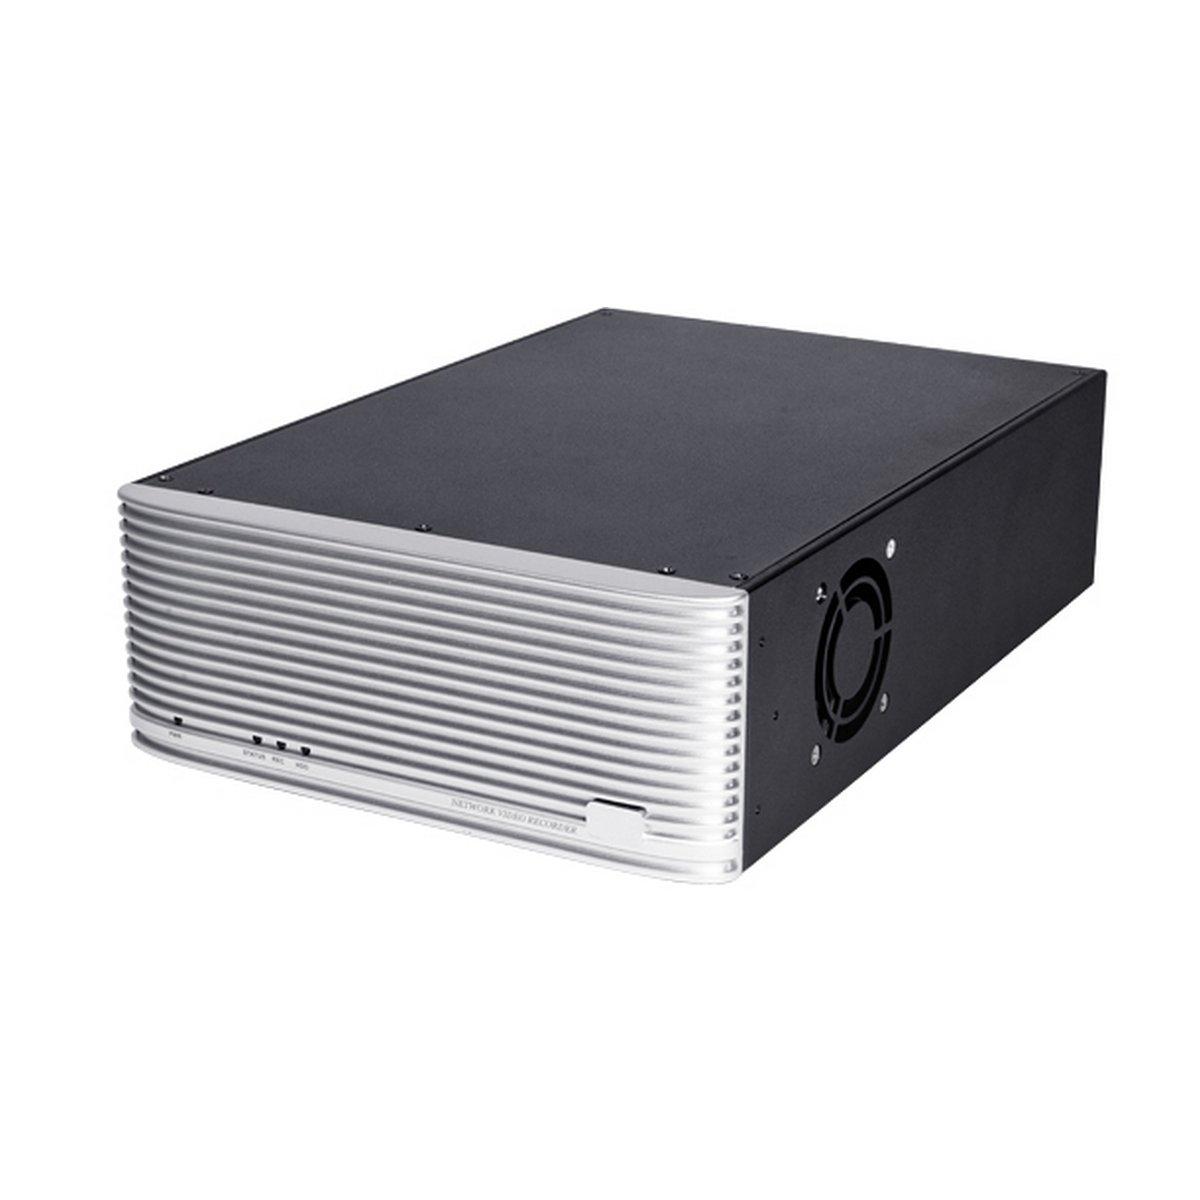 Marshall Electronics VS-NVR-910-4TB | Standalone 9 Channel Network Video Recorder 4TB Storage